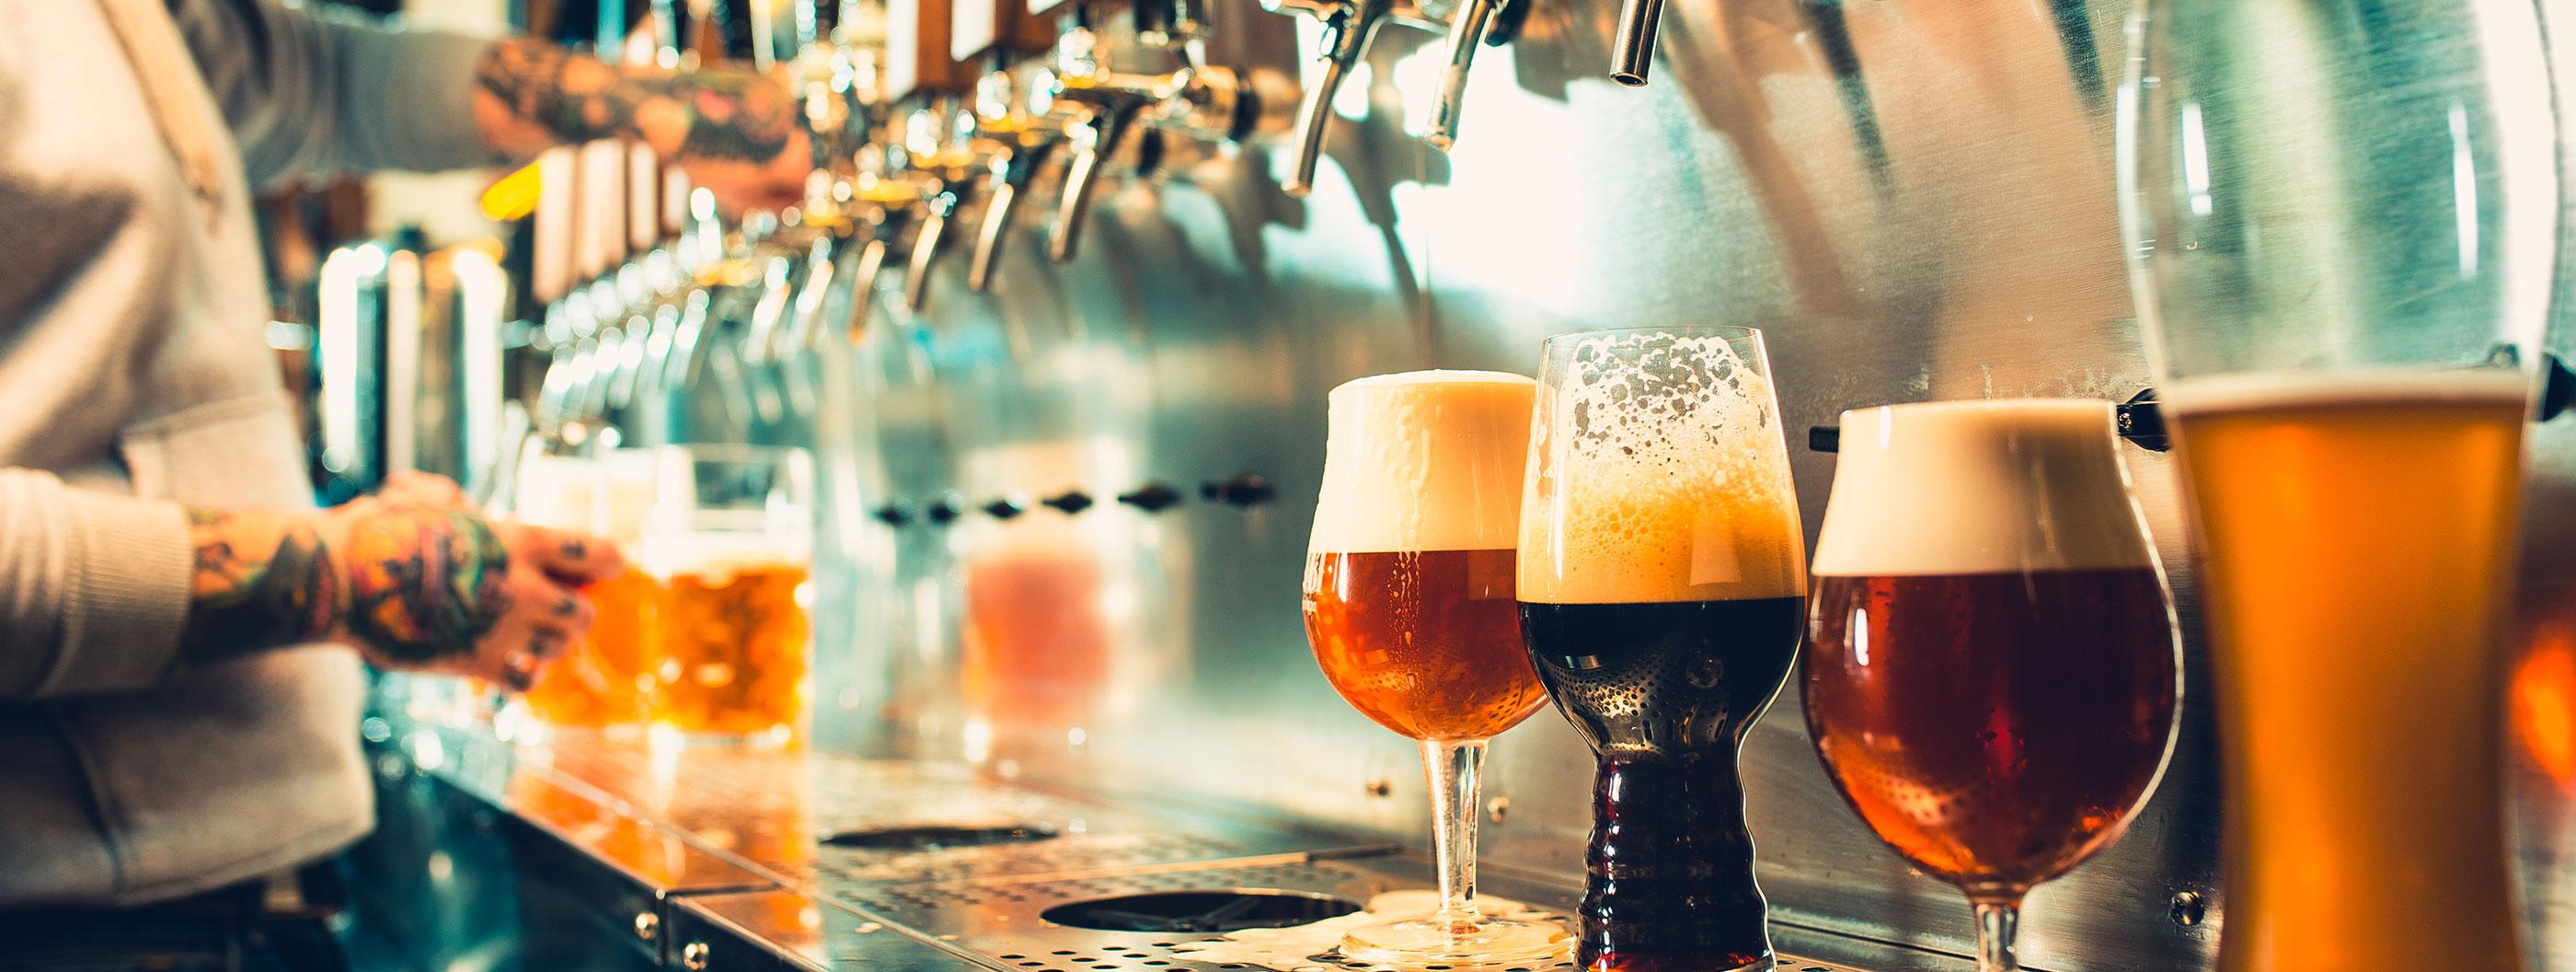 El panorama cervecero español hoy